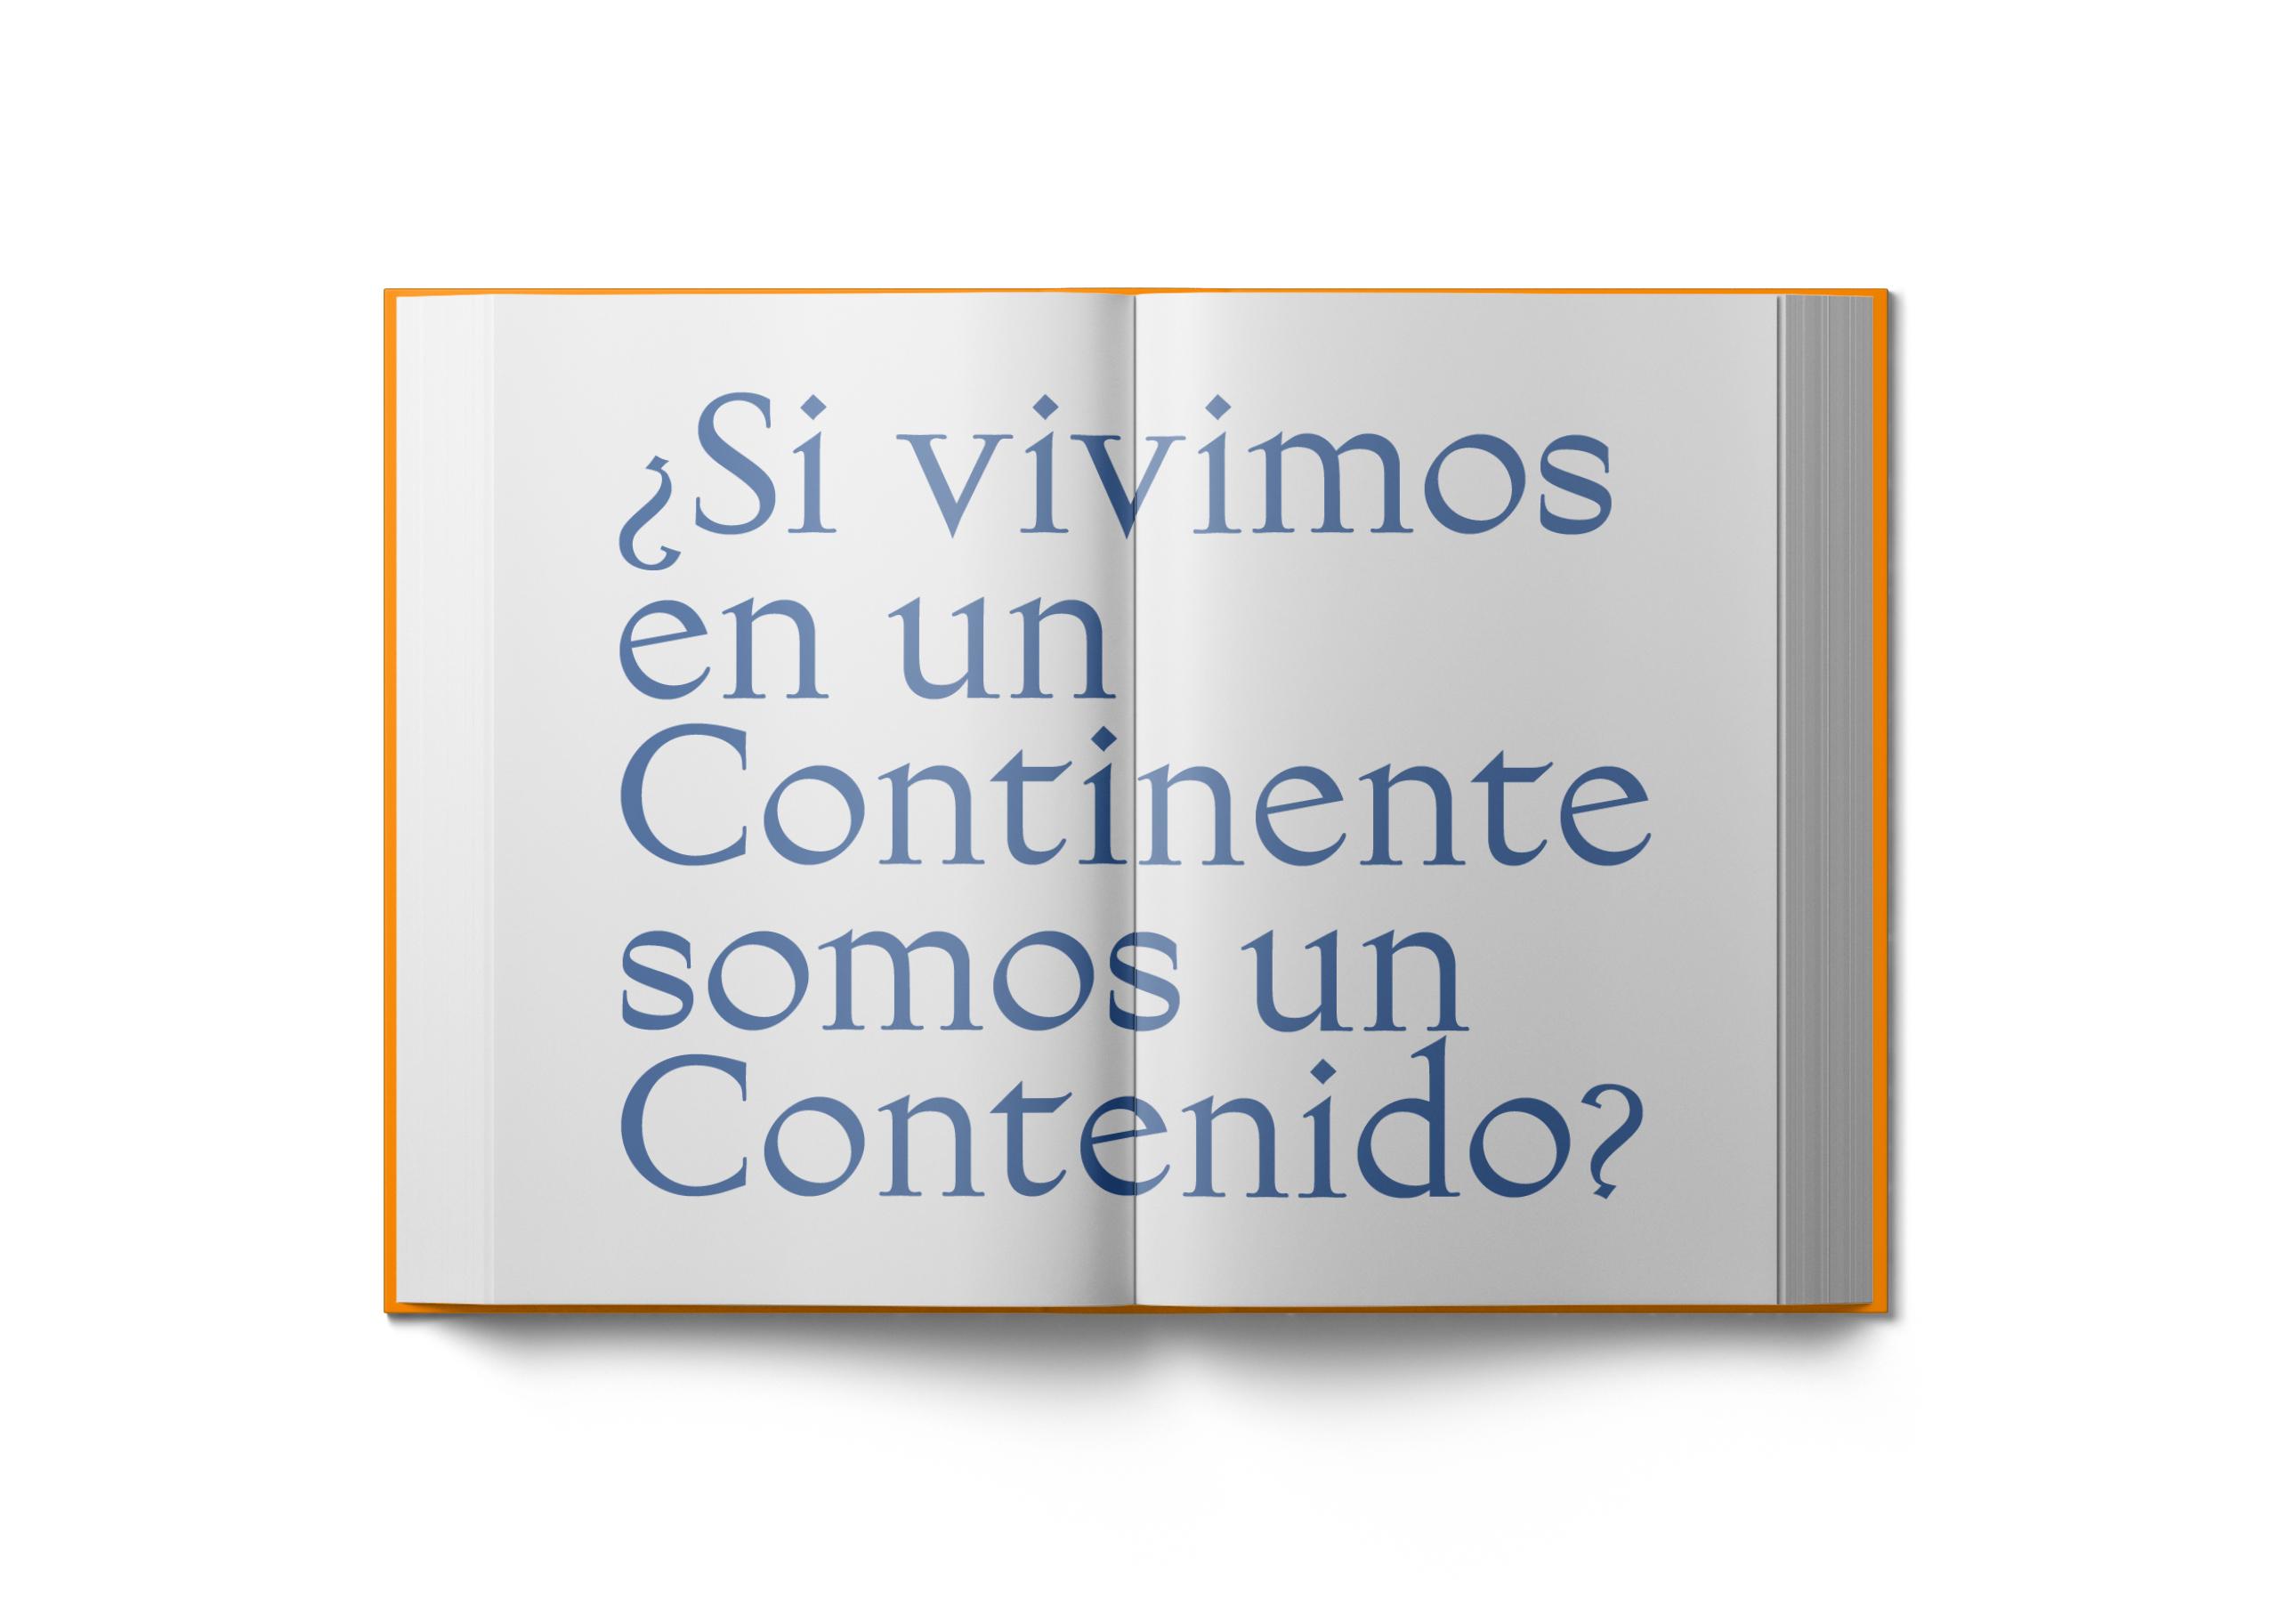 interior libro Content Continent